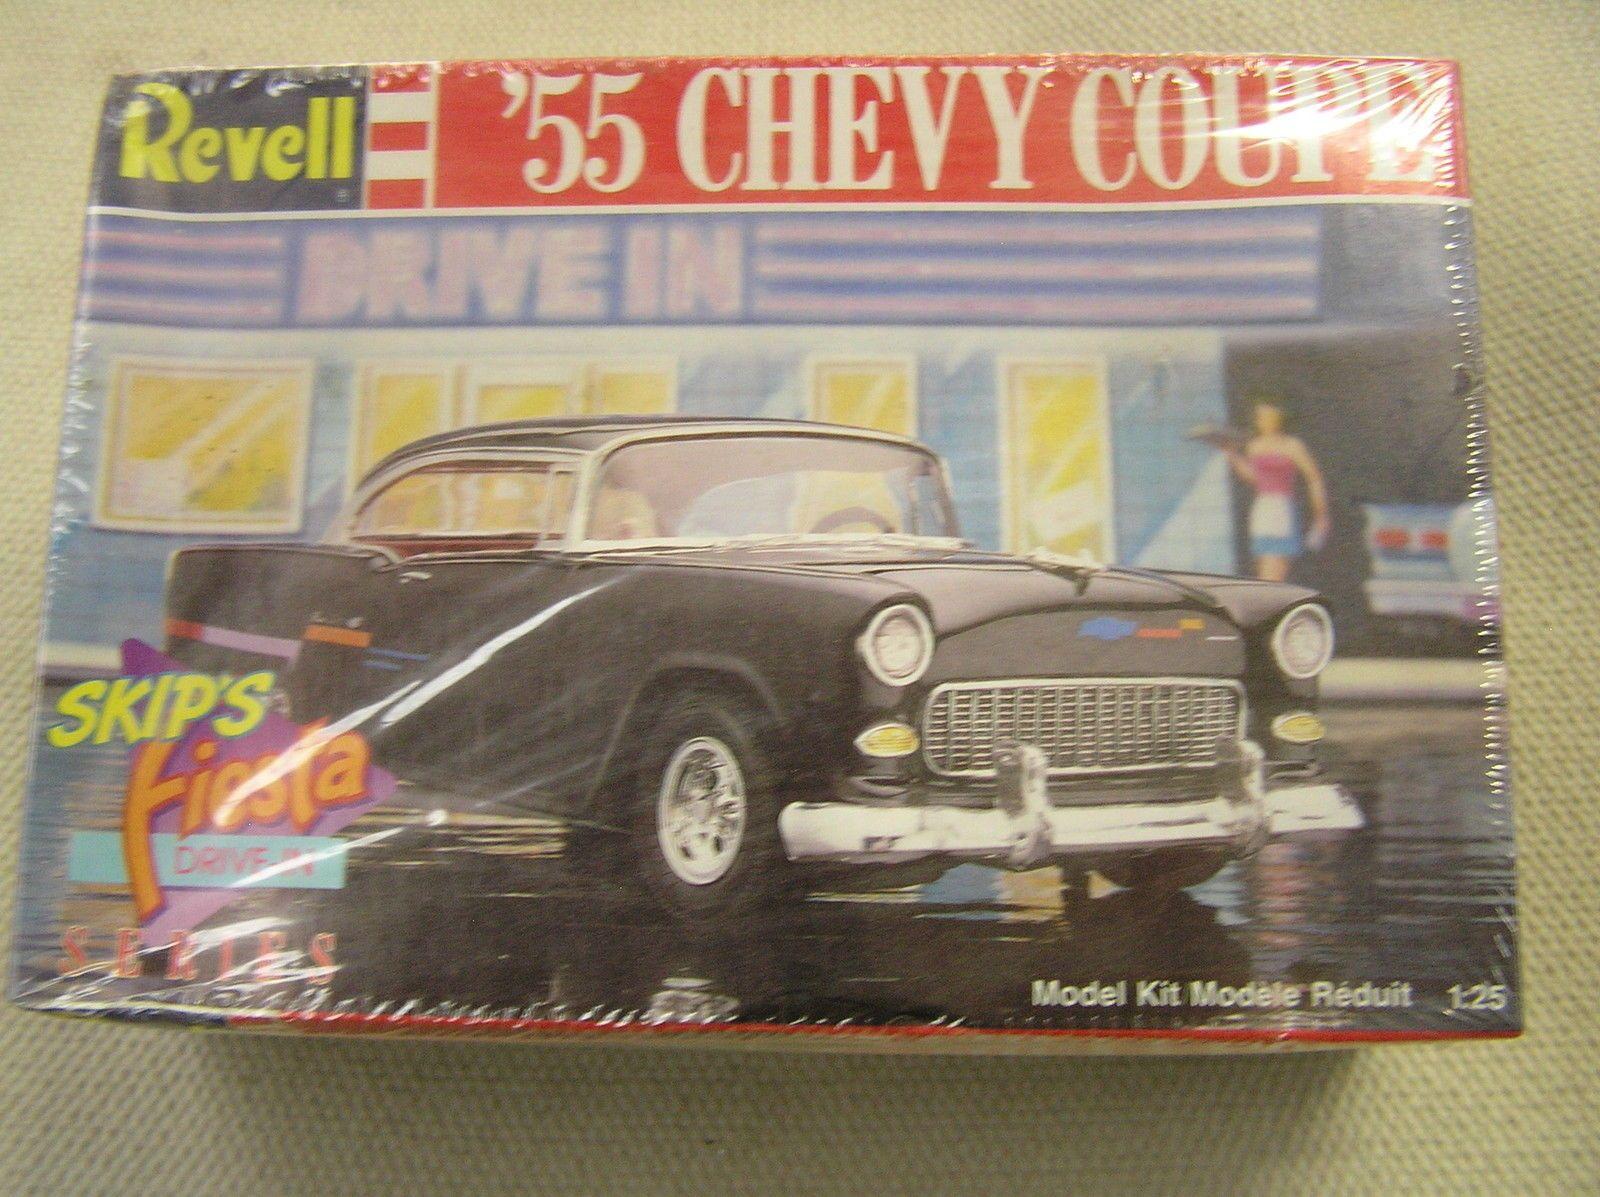 http://www.ebay.com.au/itm/Revell-vintage-model-kit-55-Chevy-Coupe ...